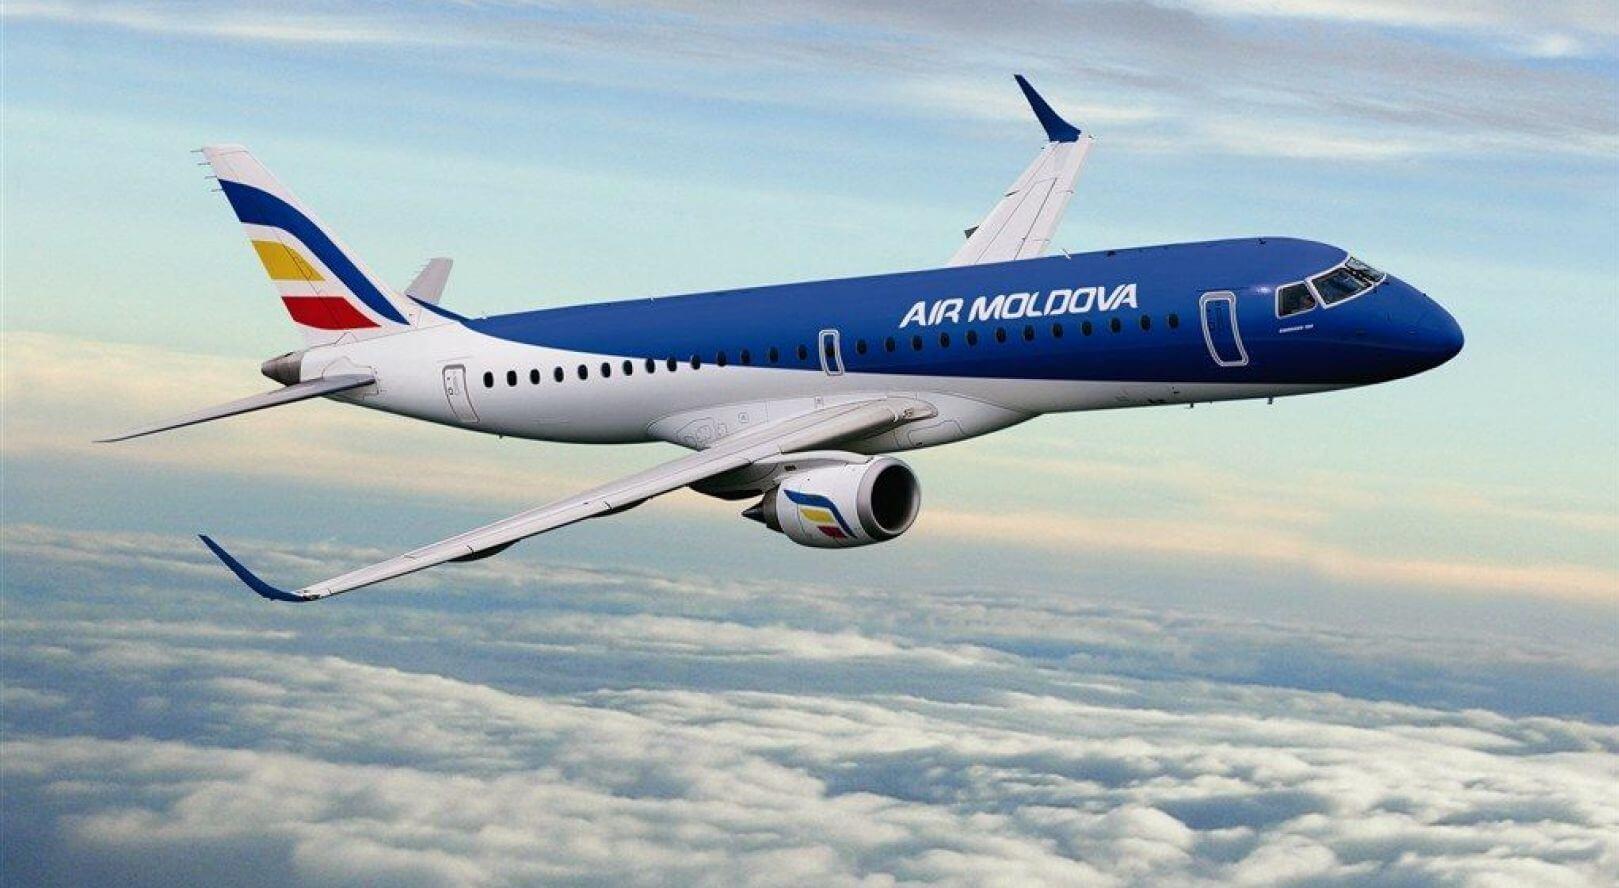 Bilete avion ieftine Airmoldova